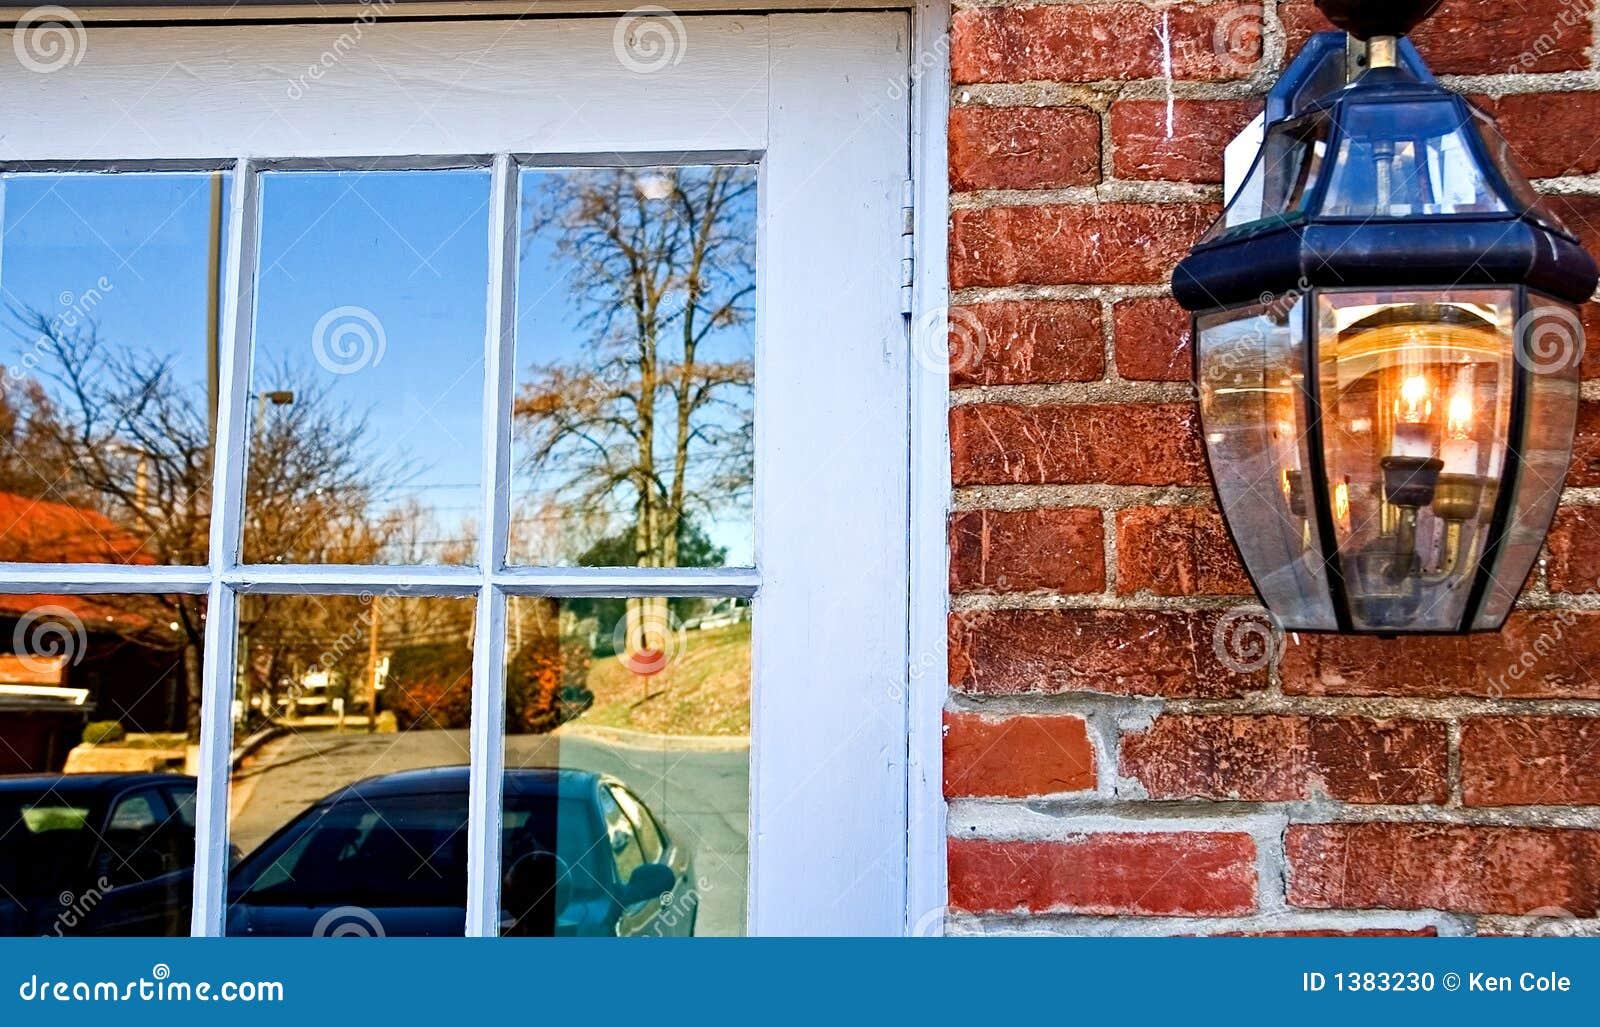 Fall Window Reflections Stock Photo Image 1383230